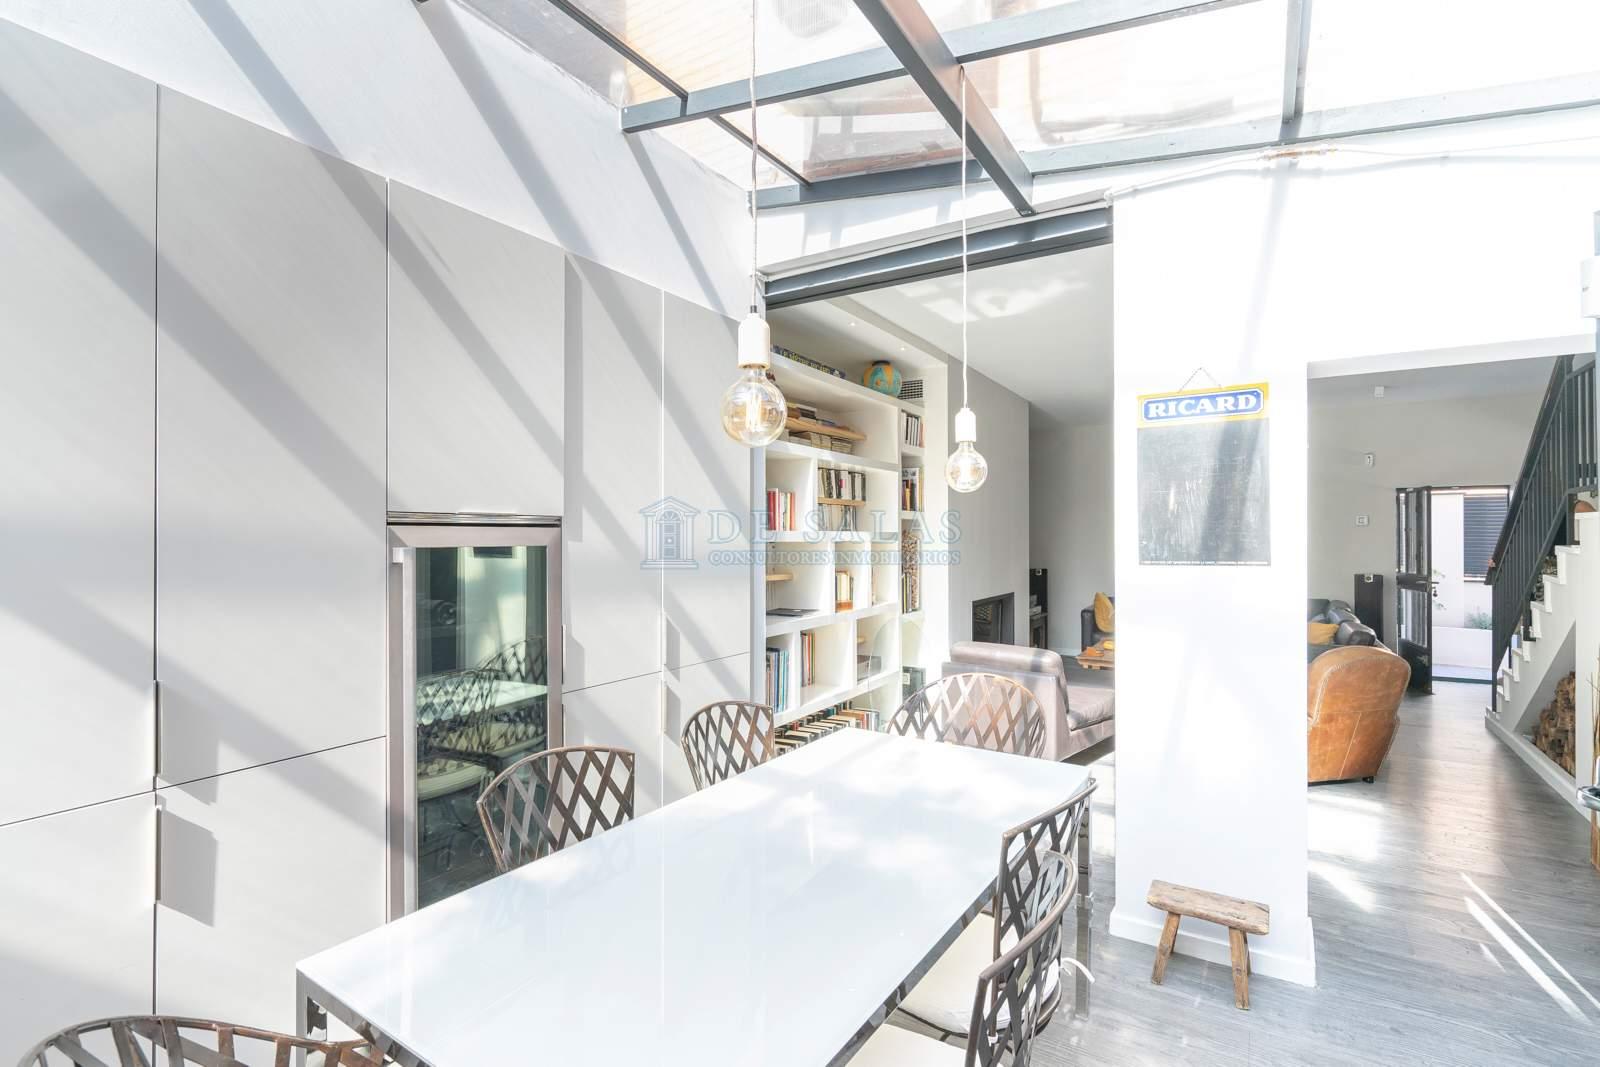 21 Maison Arturo Soria